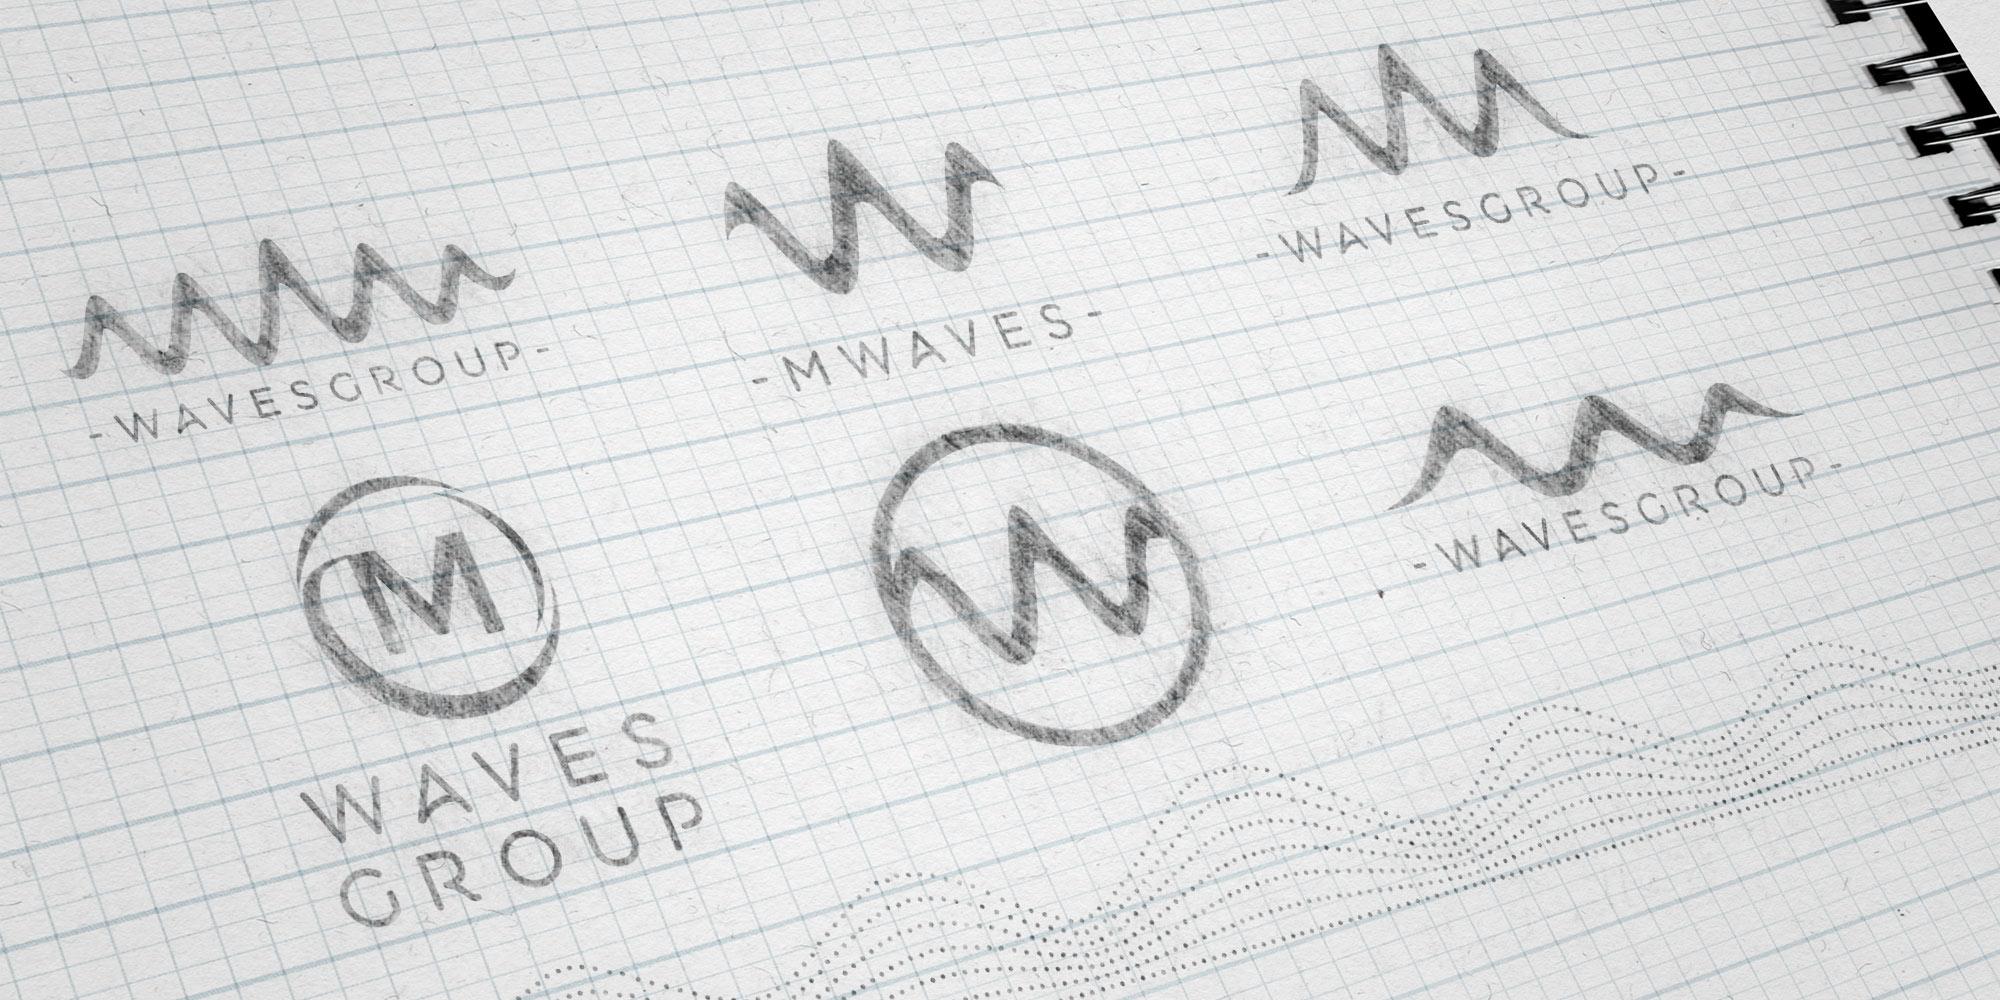 Waves Group Logo Ideas